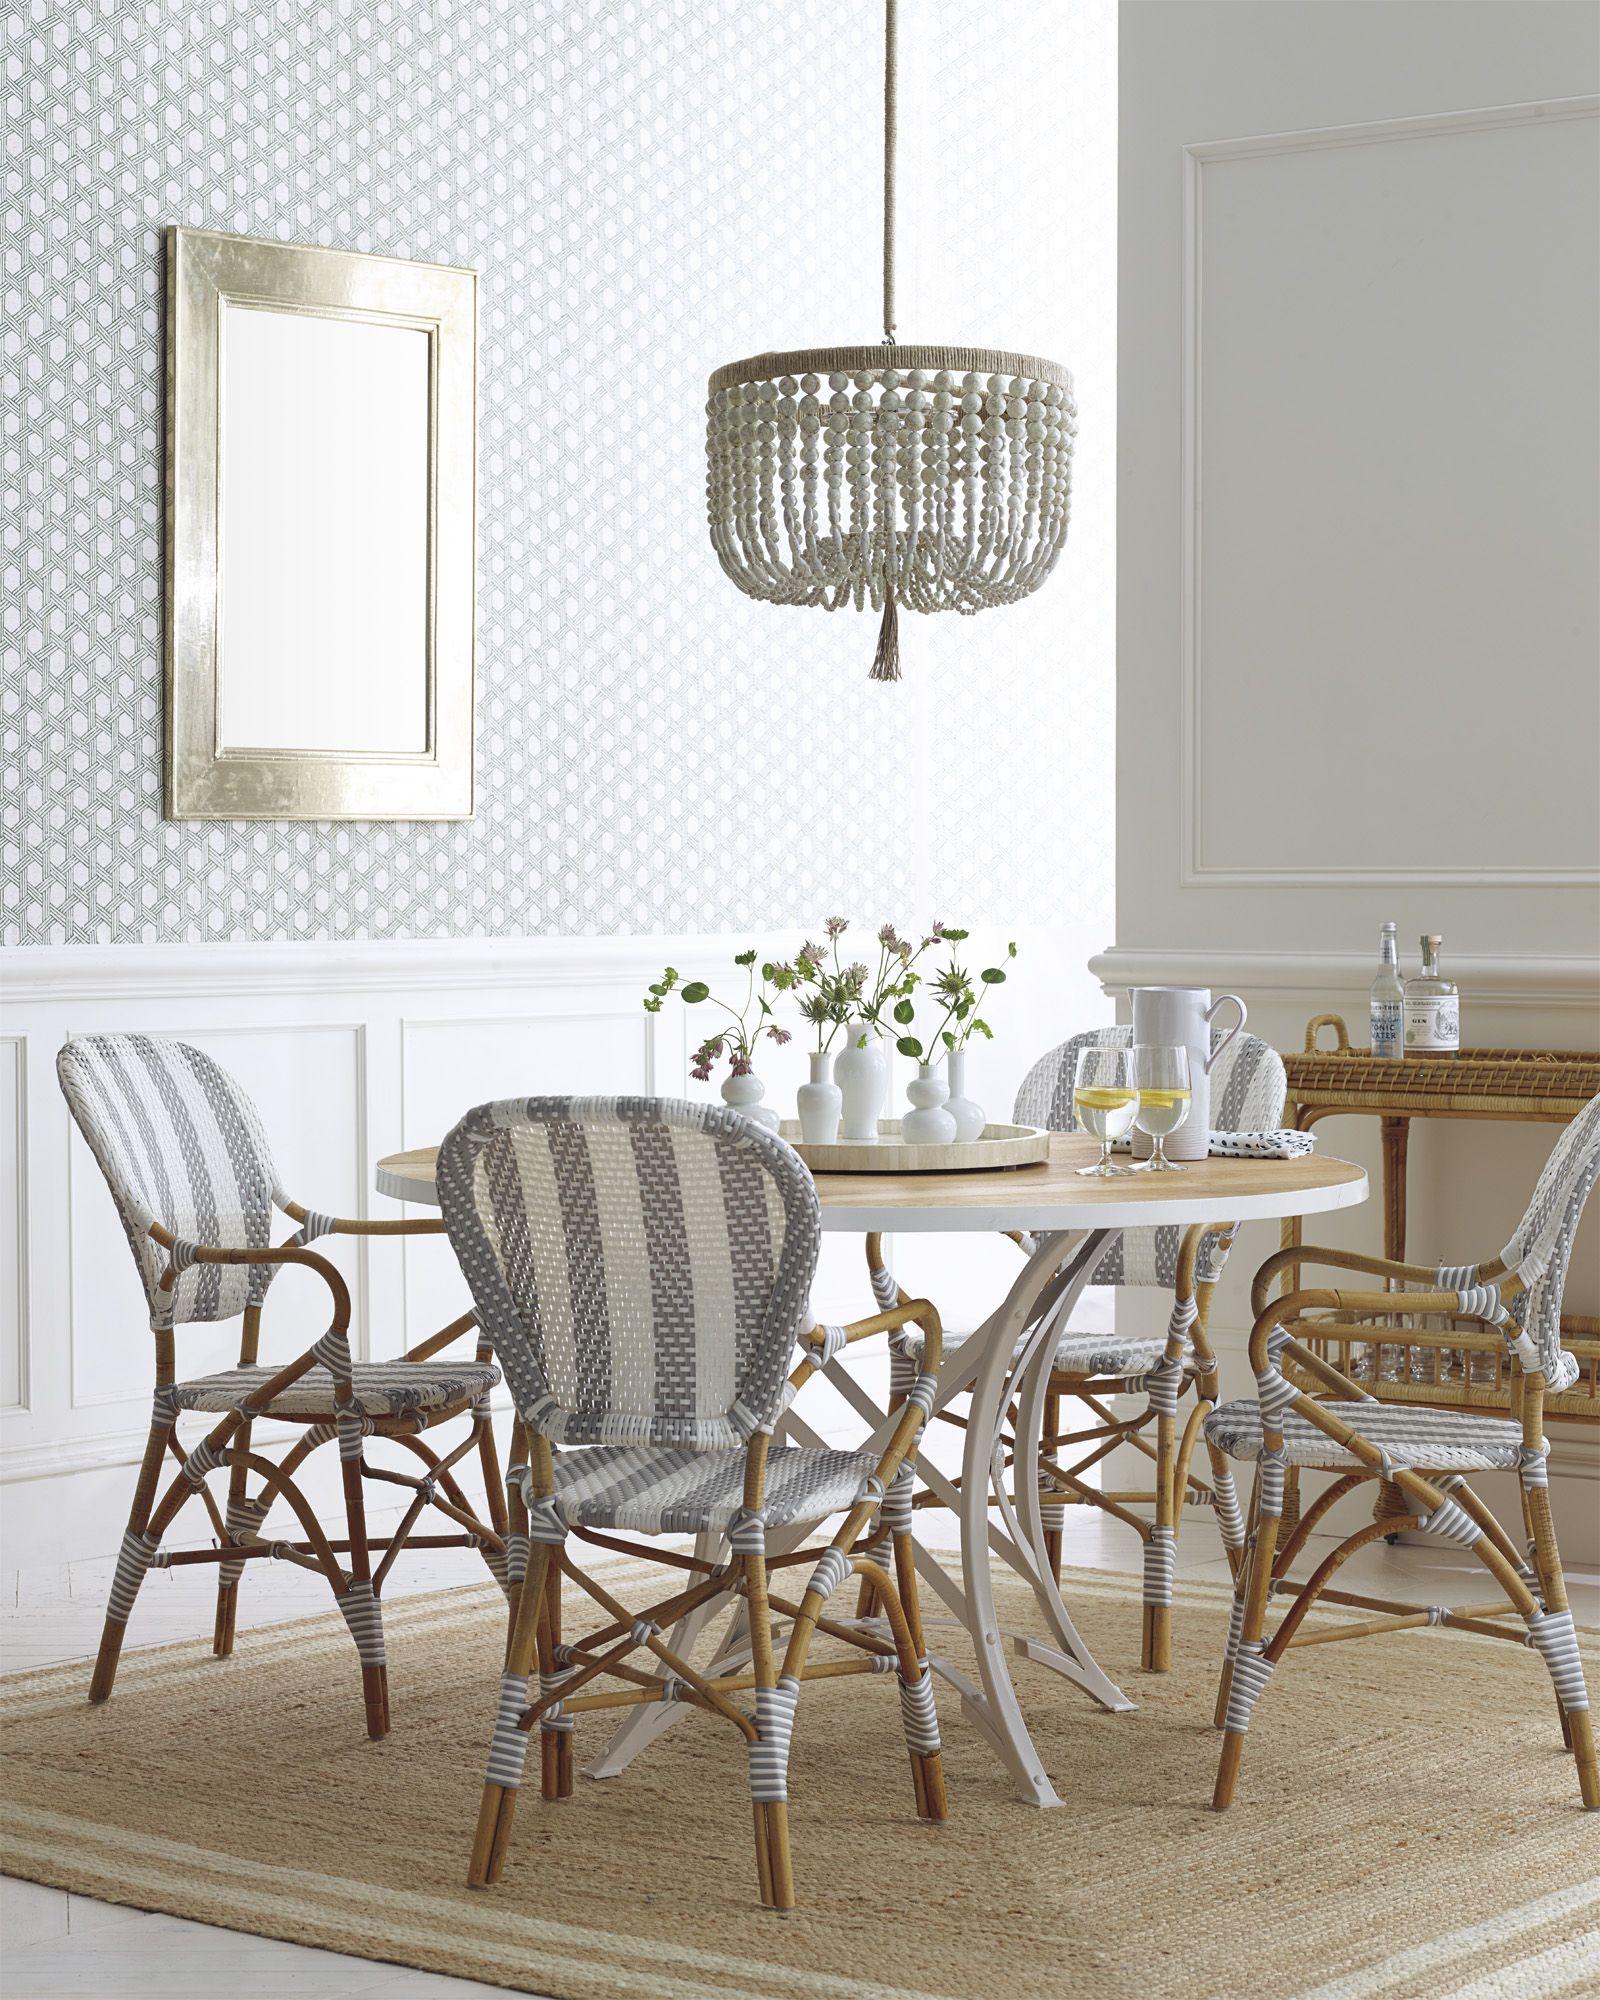 cayman cork wallpaper & riviera armchairs via serena & lily